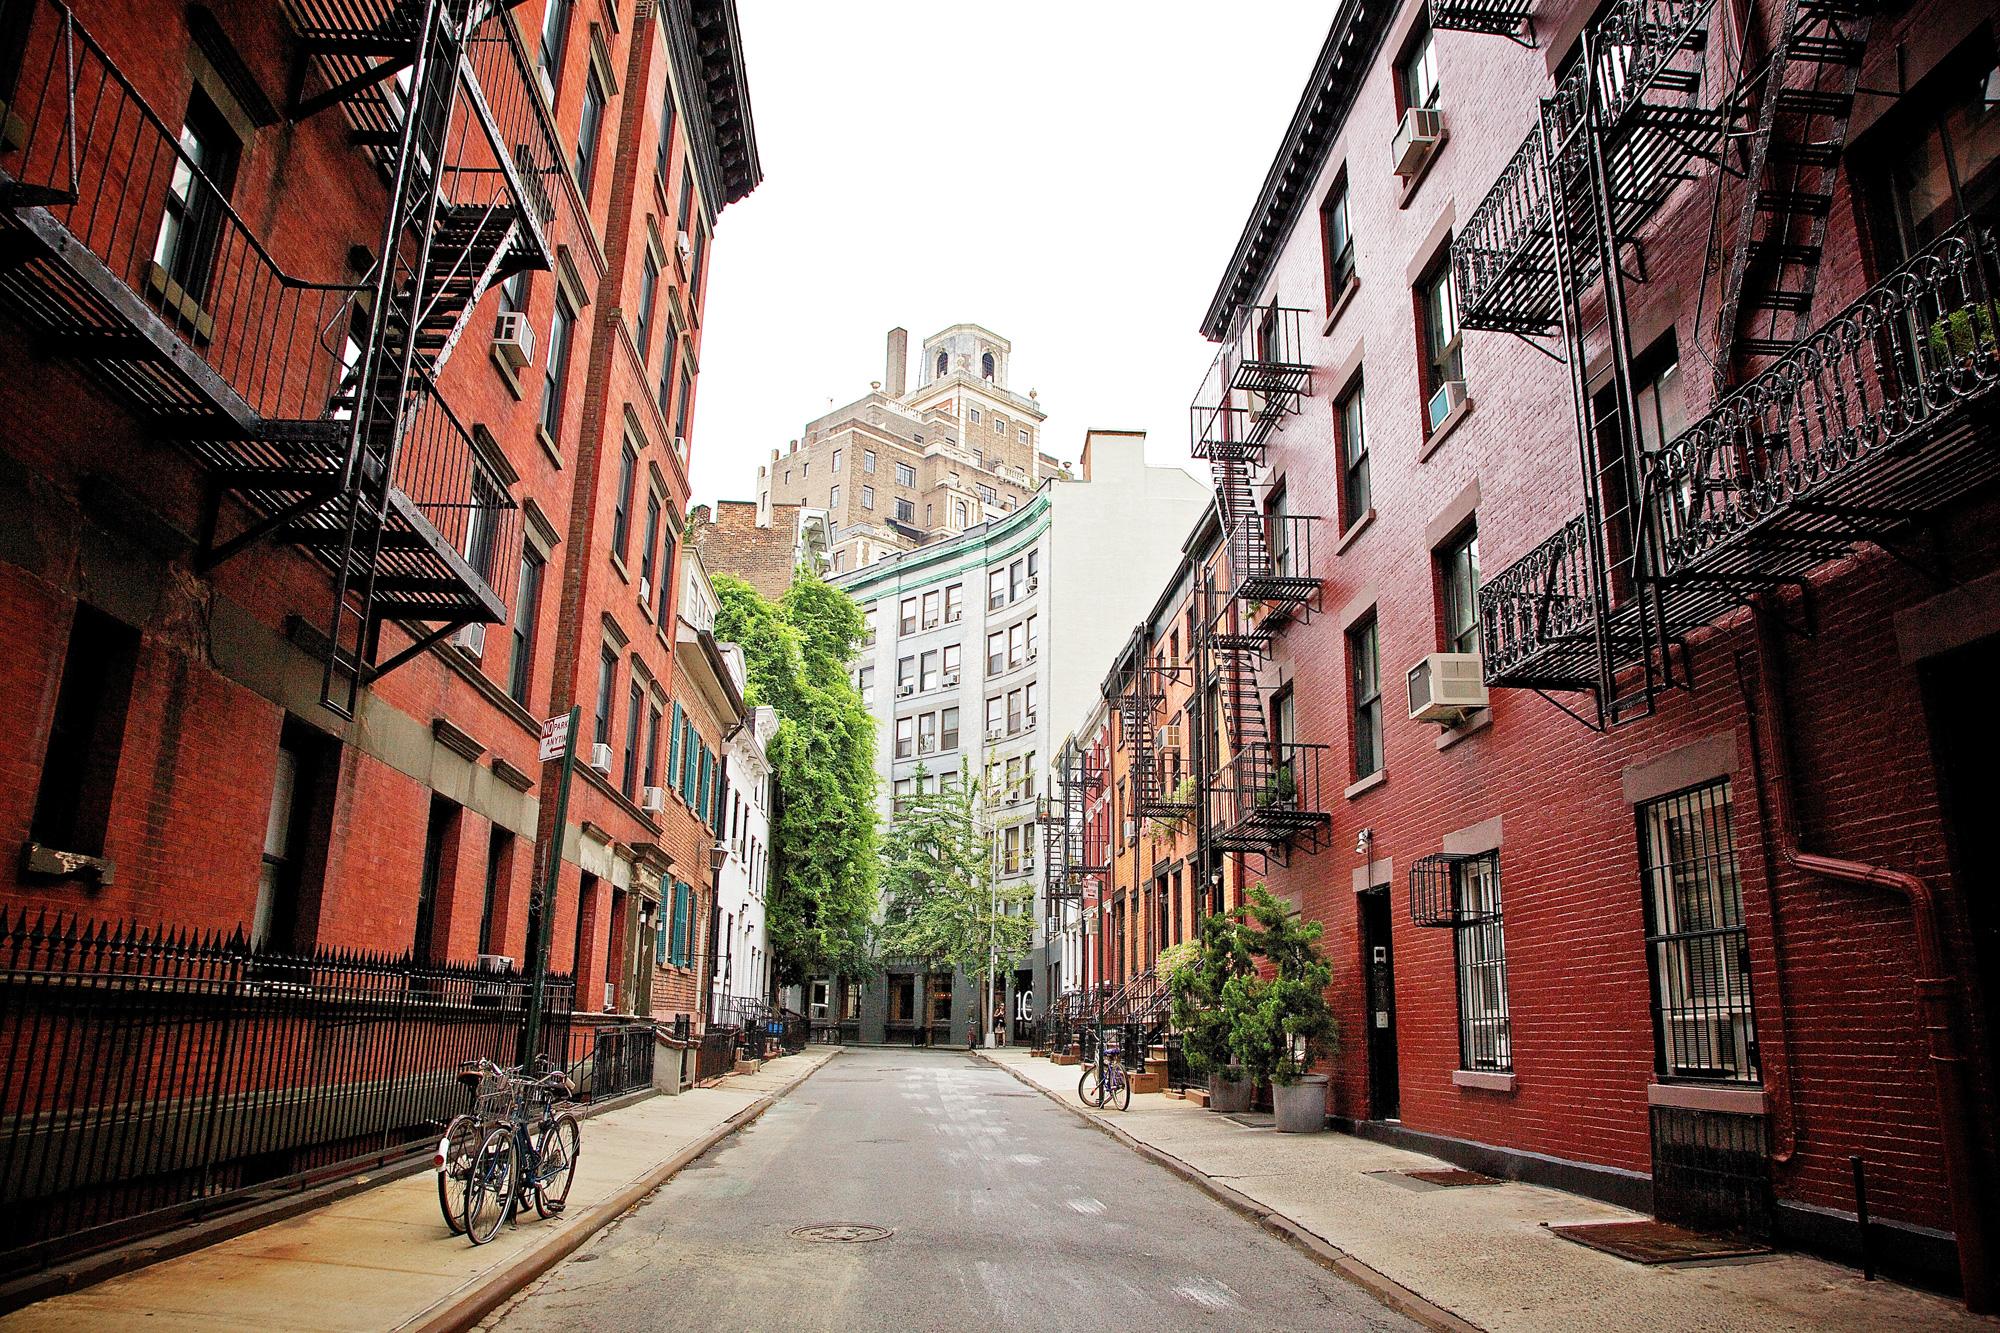 urban, Cityscape, Street Wallpapers HD / Desktop and